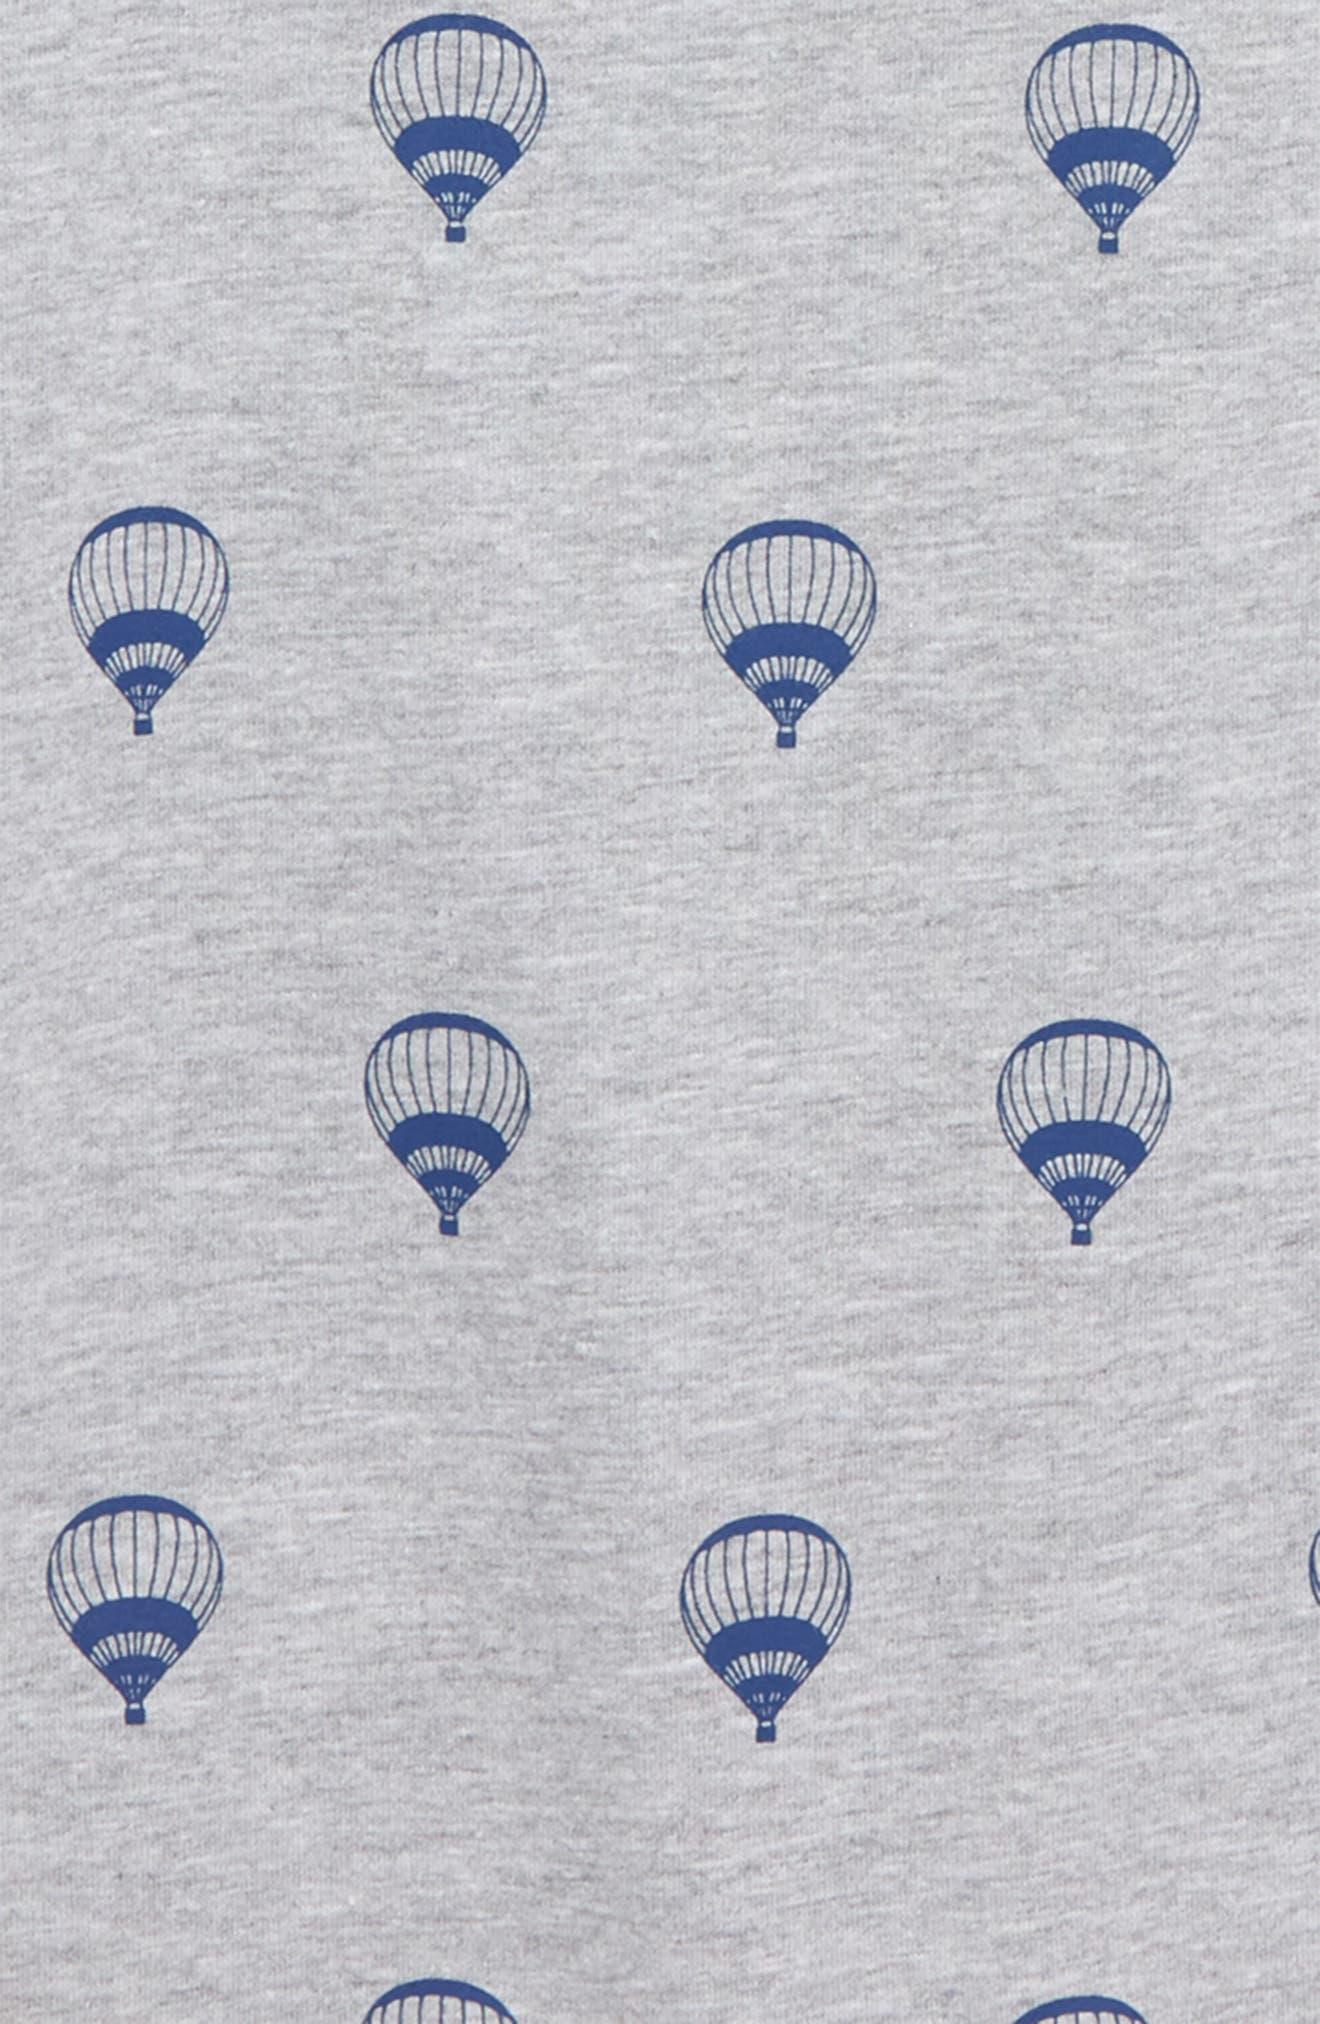 Hot Air Balloon Print Henley,                             Alternate thumbnail 2, color,                             Grey